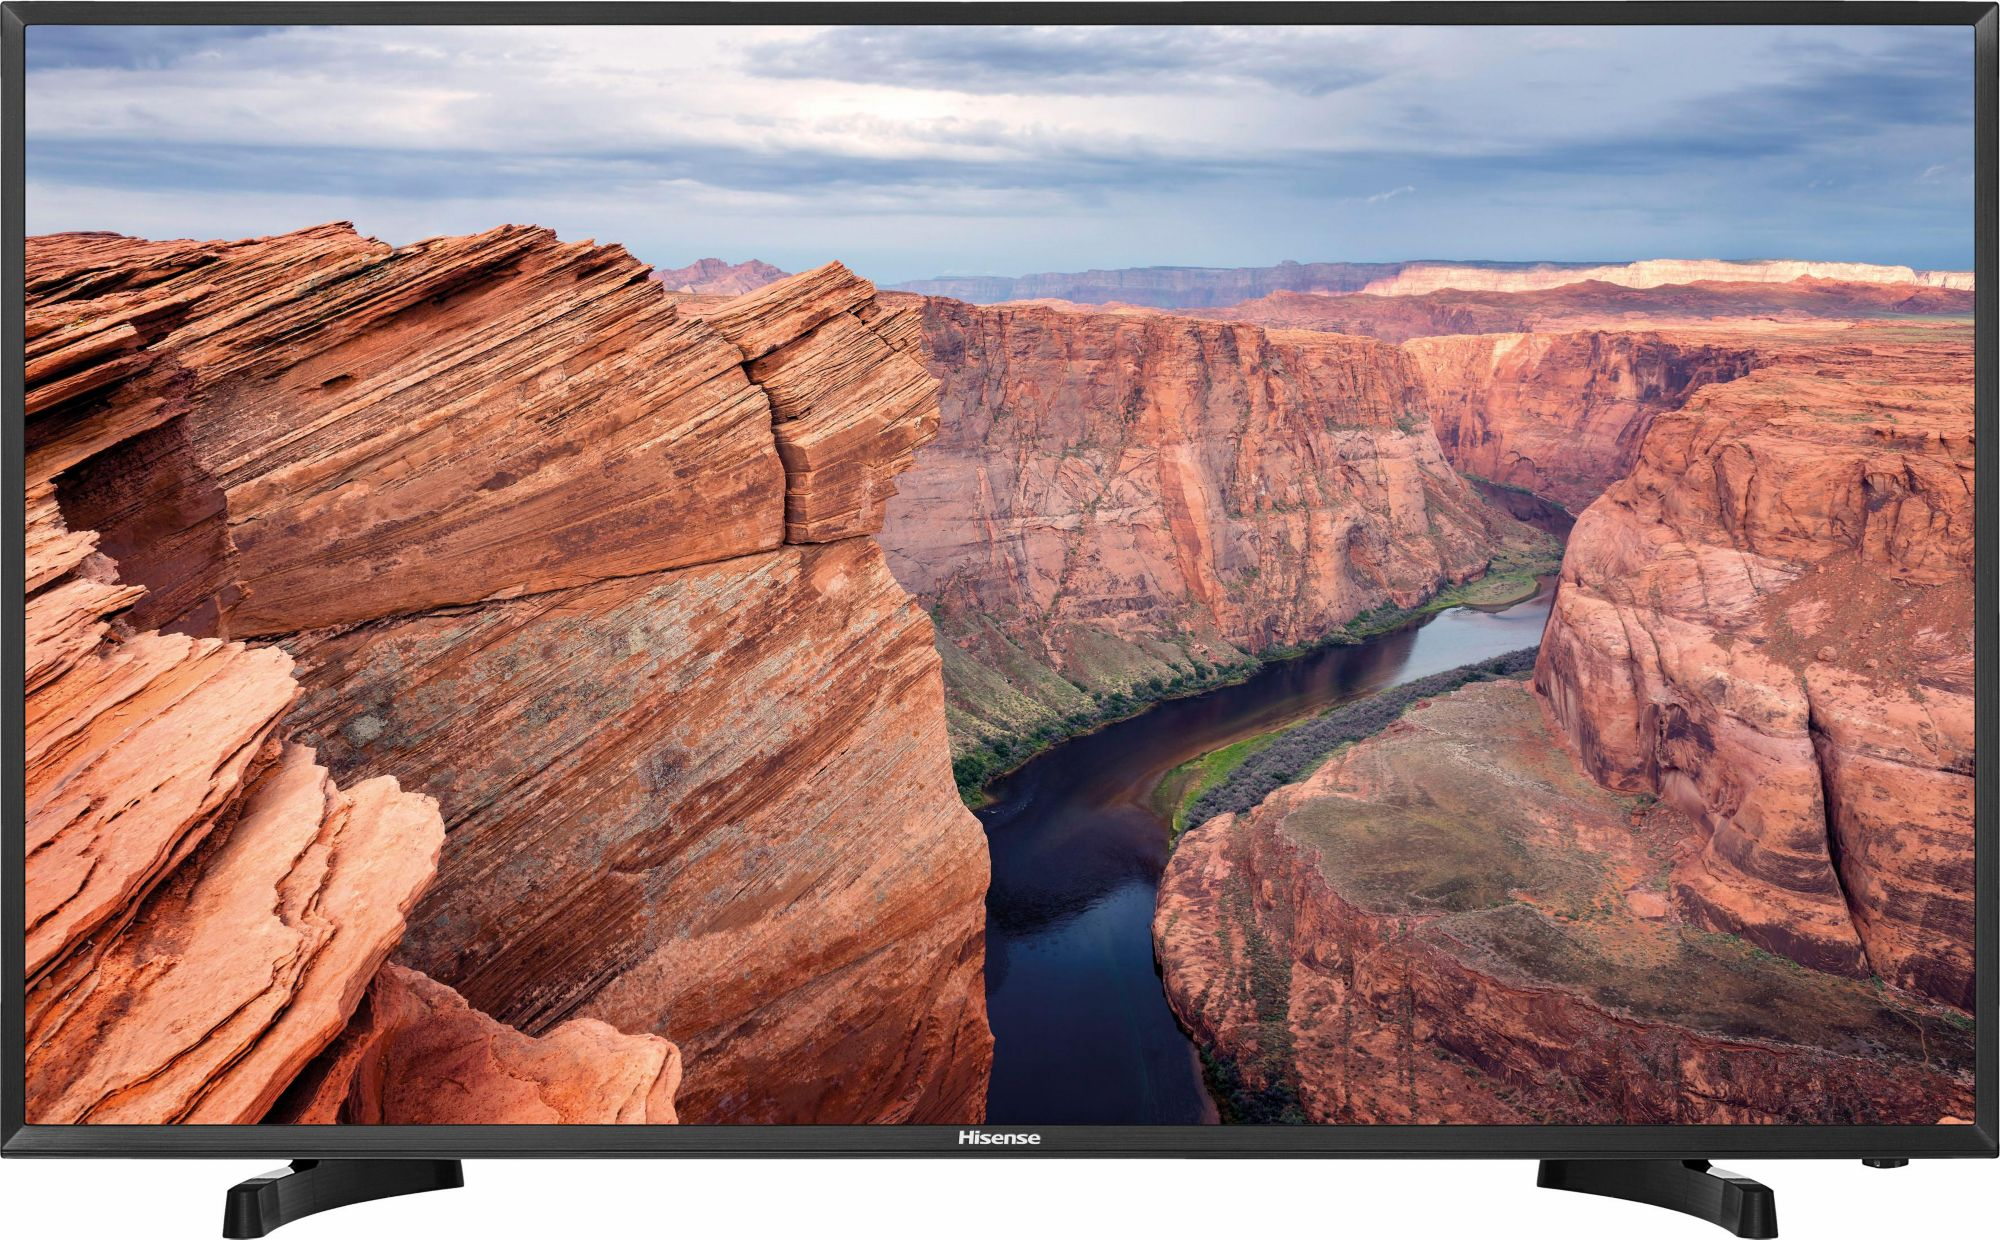 HISENSE Hisense H49M2100S, LED Fernseher, 123 cm (49 Zoll), 1080p (Full HD)